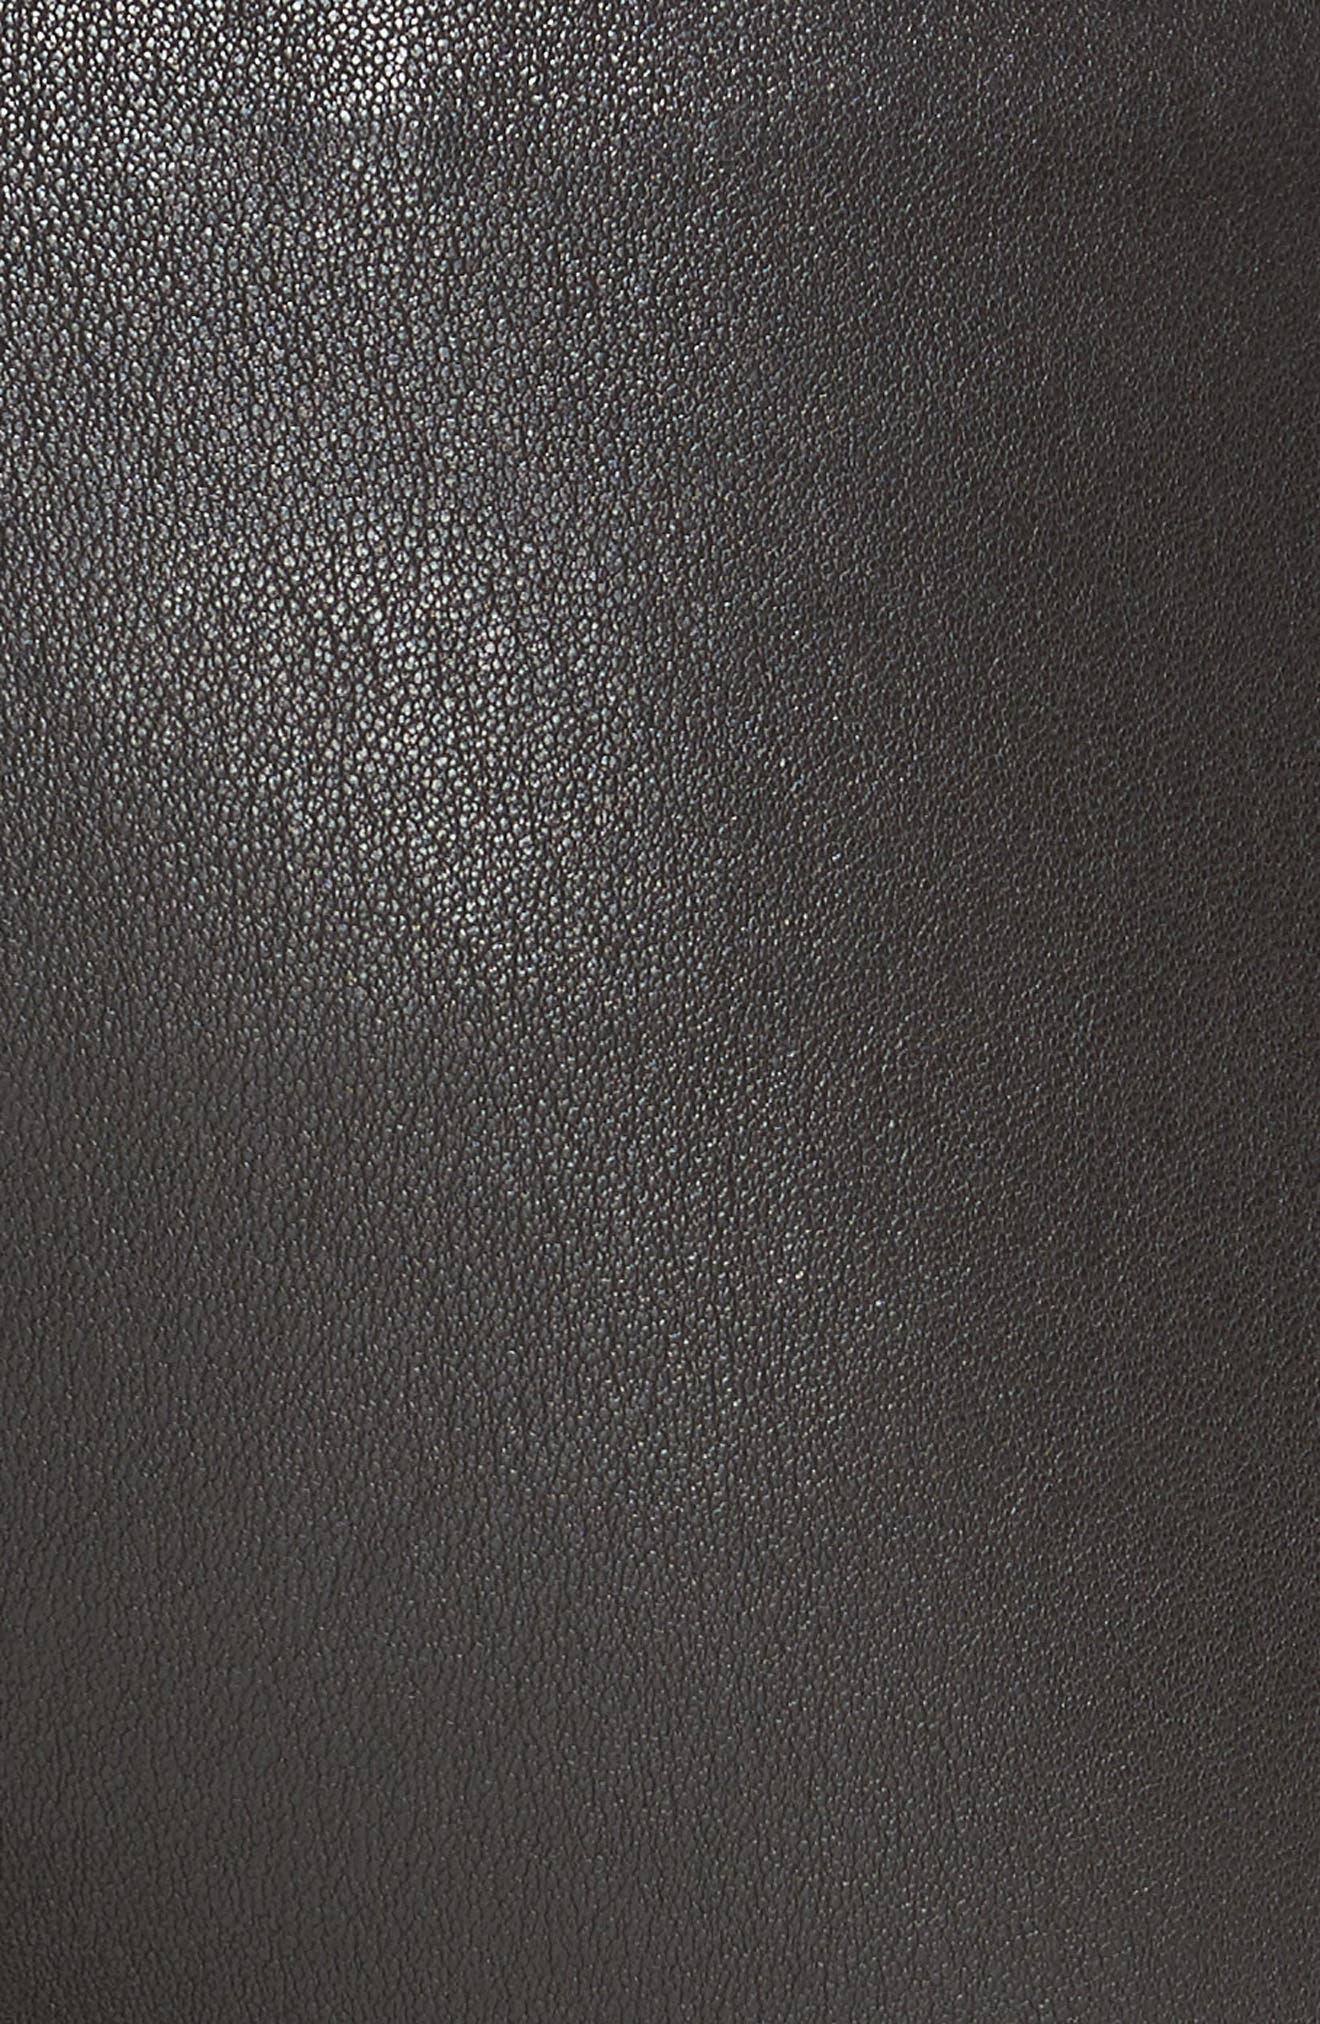 HELMUT LANG, Stretch Lambskin Leather Leggings, Alternate thumbnail 6, color, BLACK